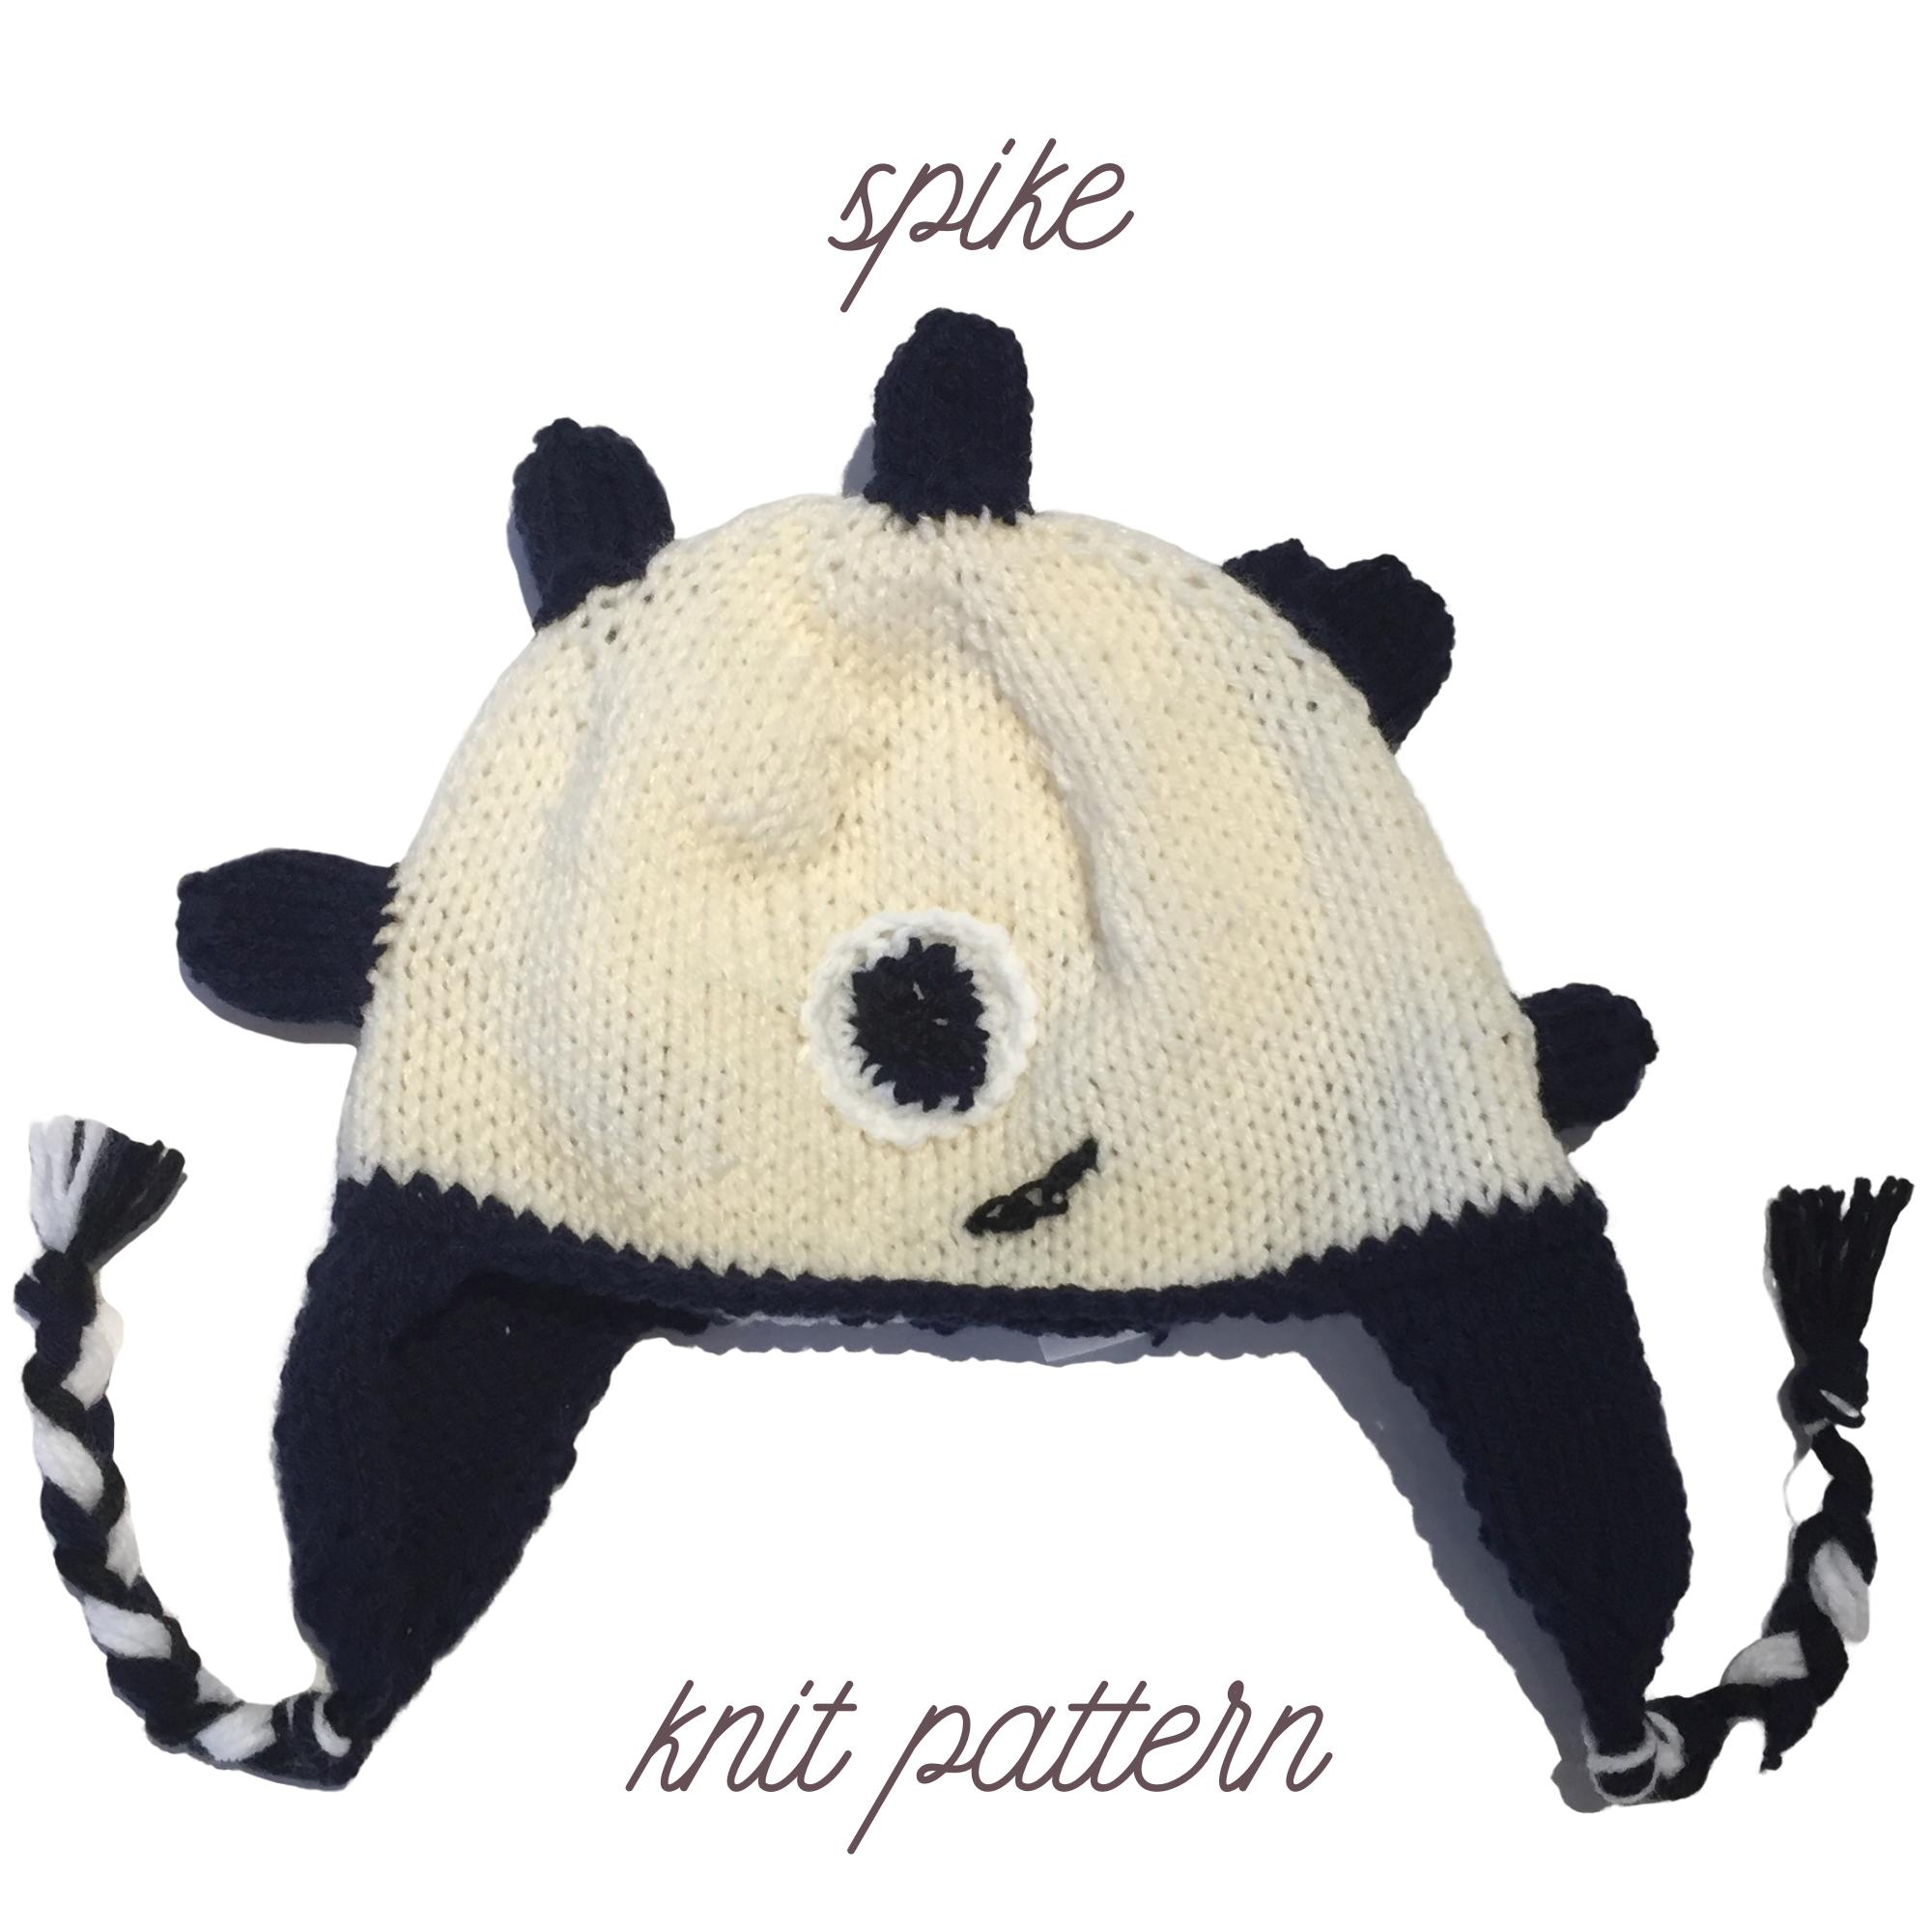 spike knit hat pattern image – 2000×2000